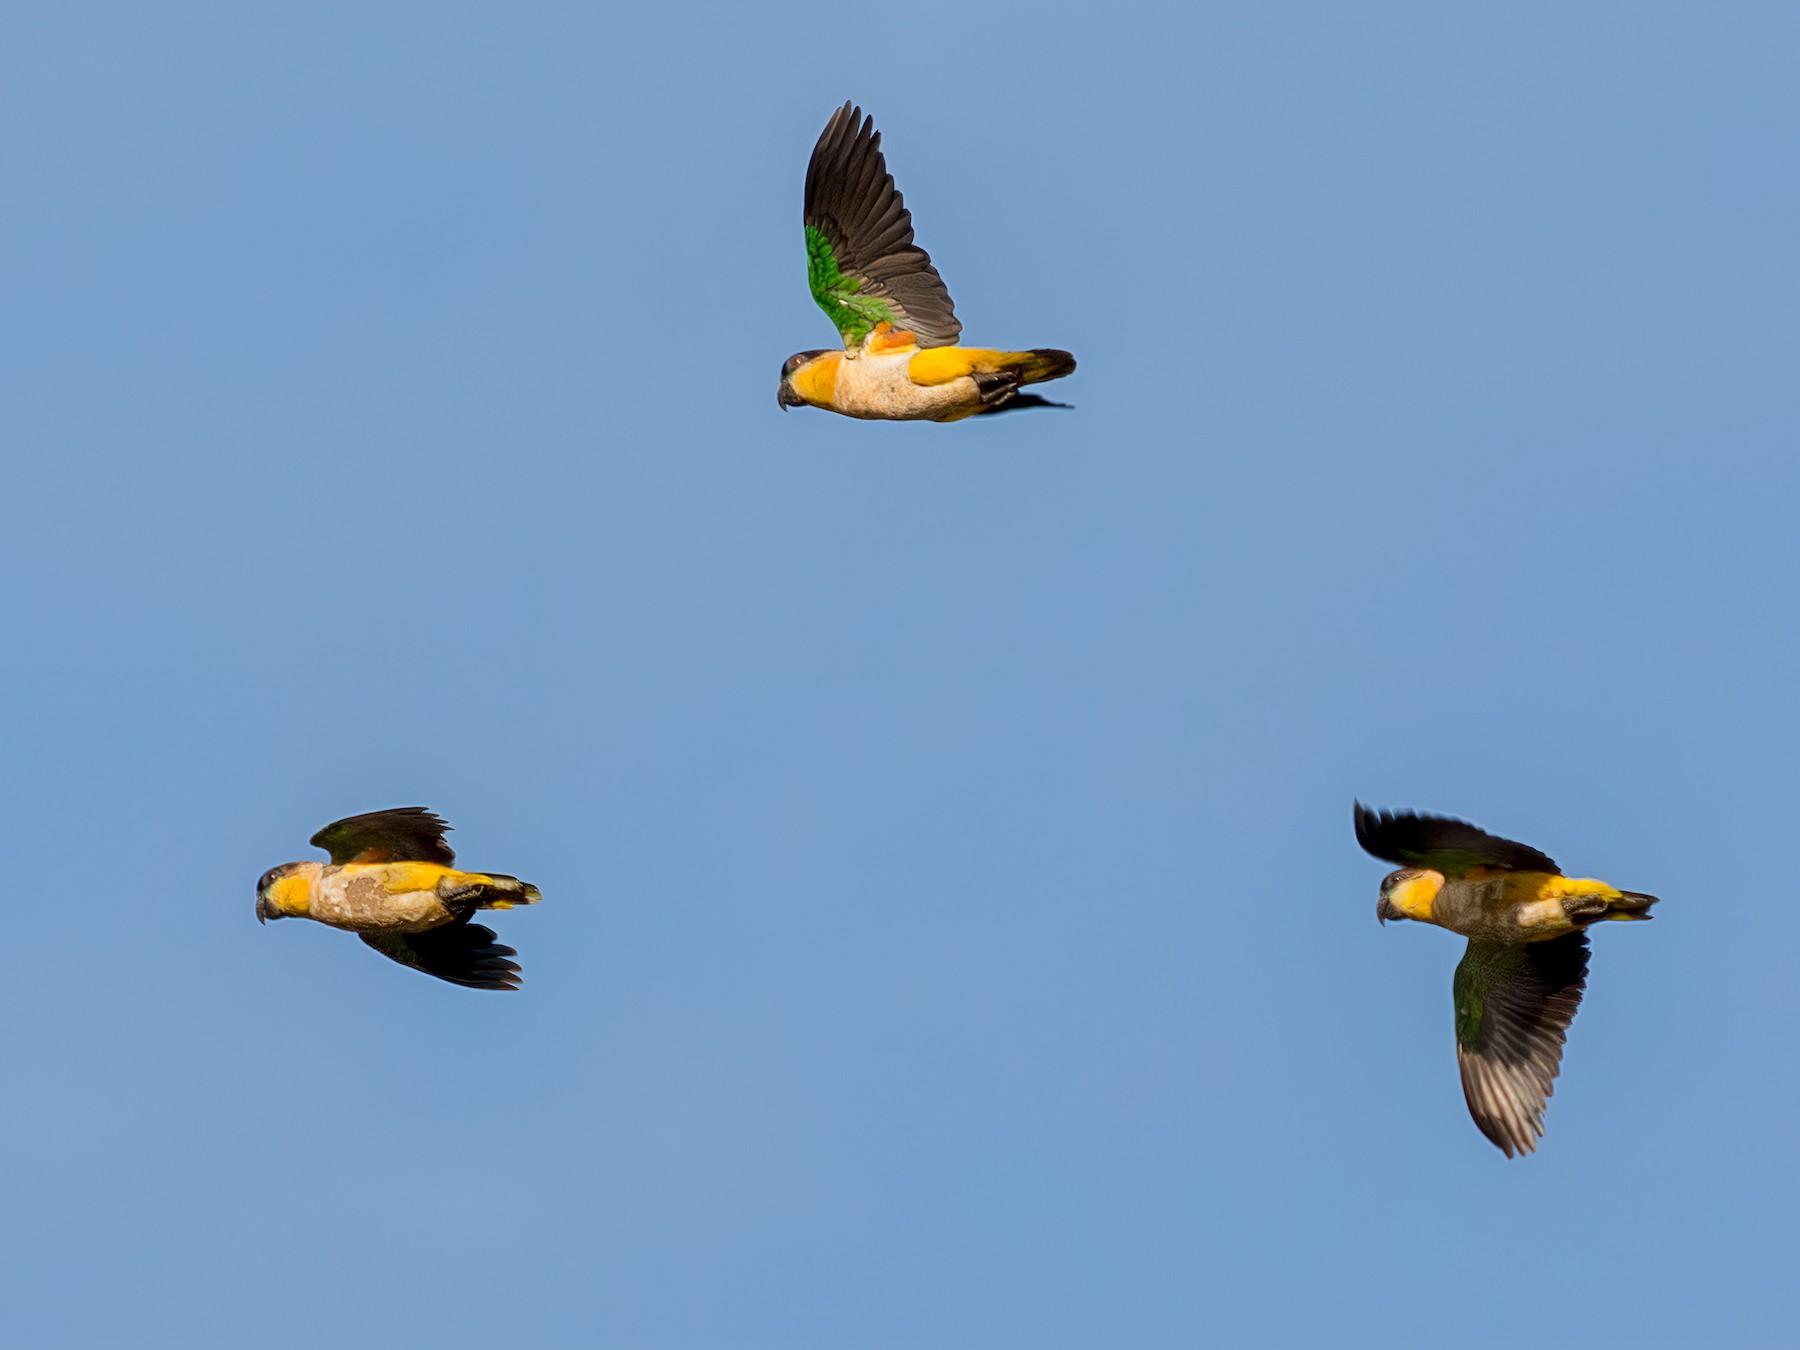 Black-headed Parrot - Renato Espinosa